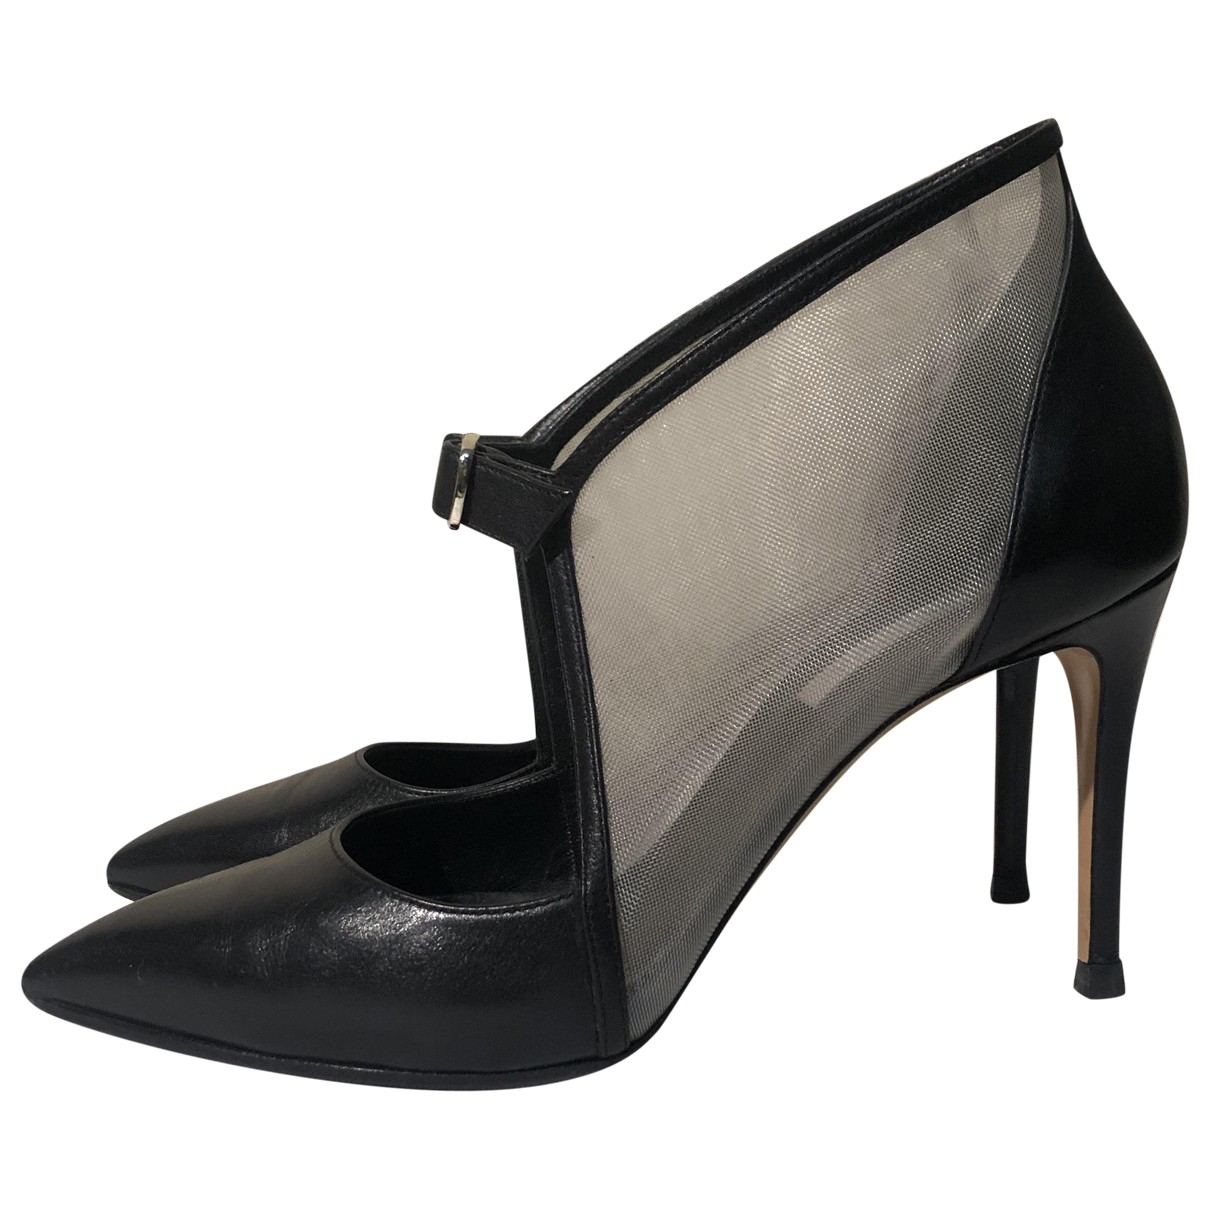 Casadei \N Black Leather Heels for Women 37 EU